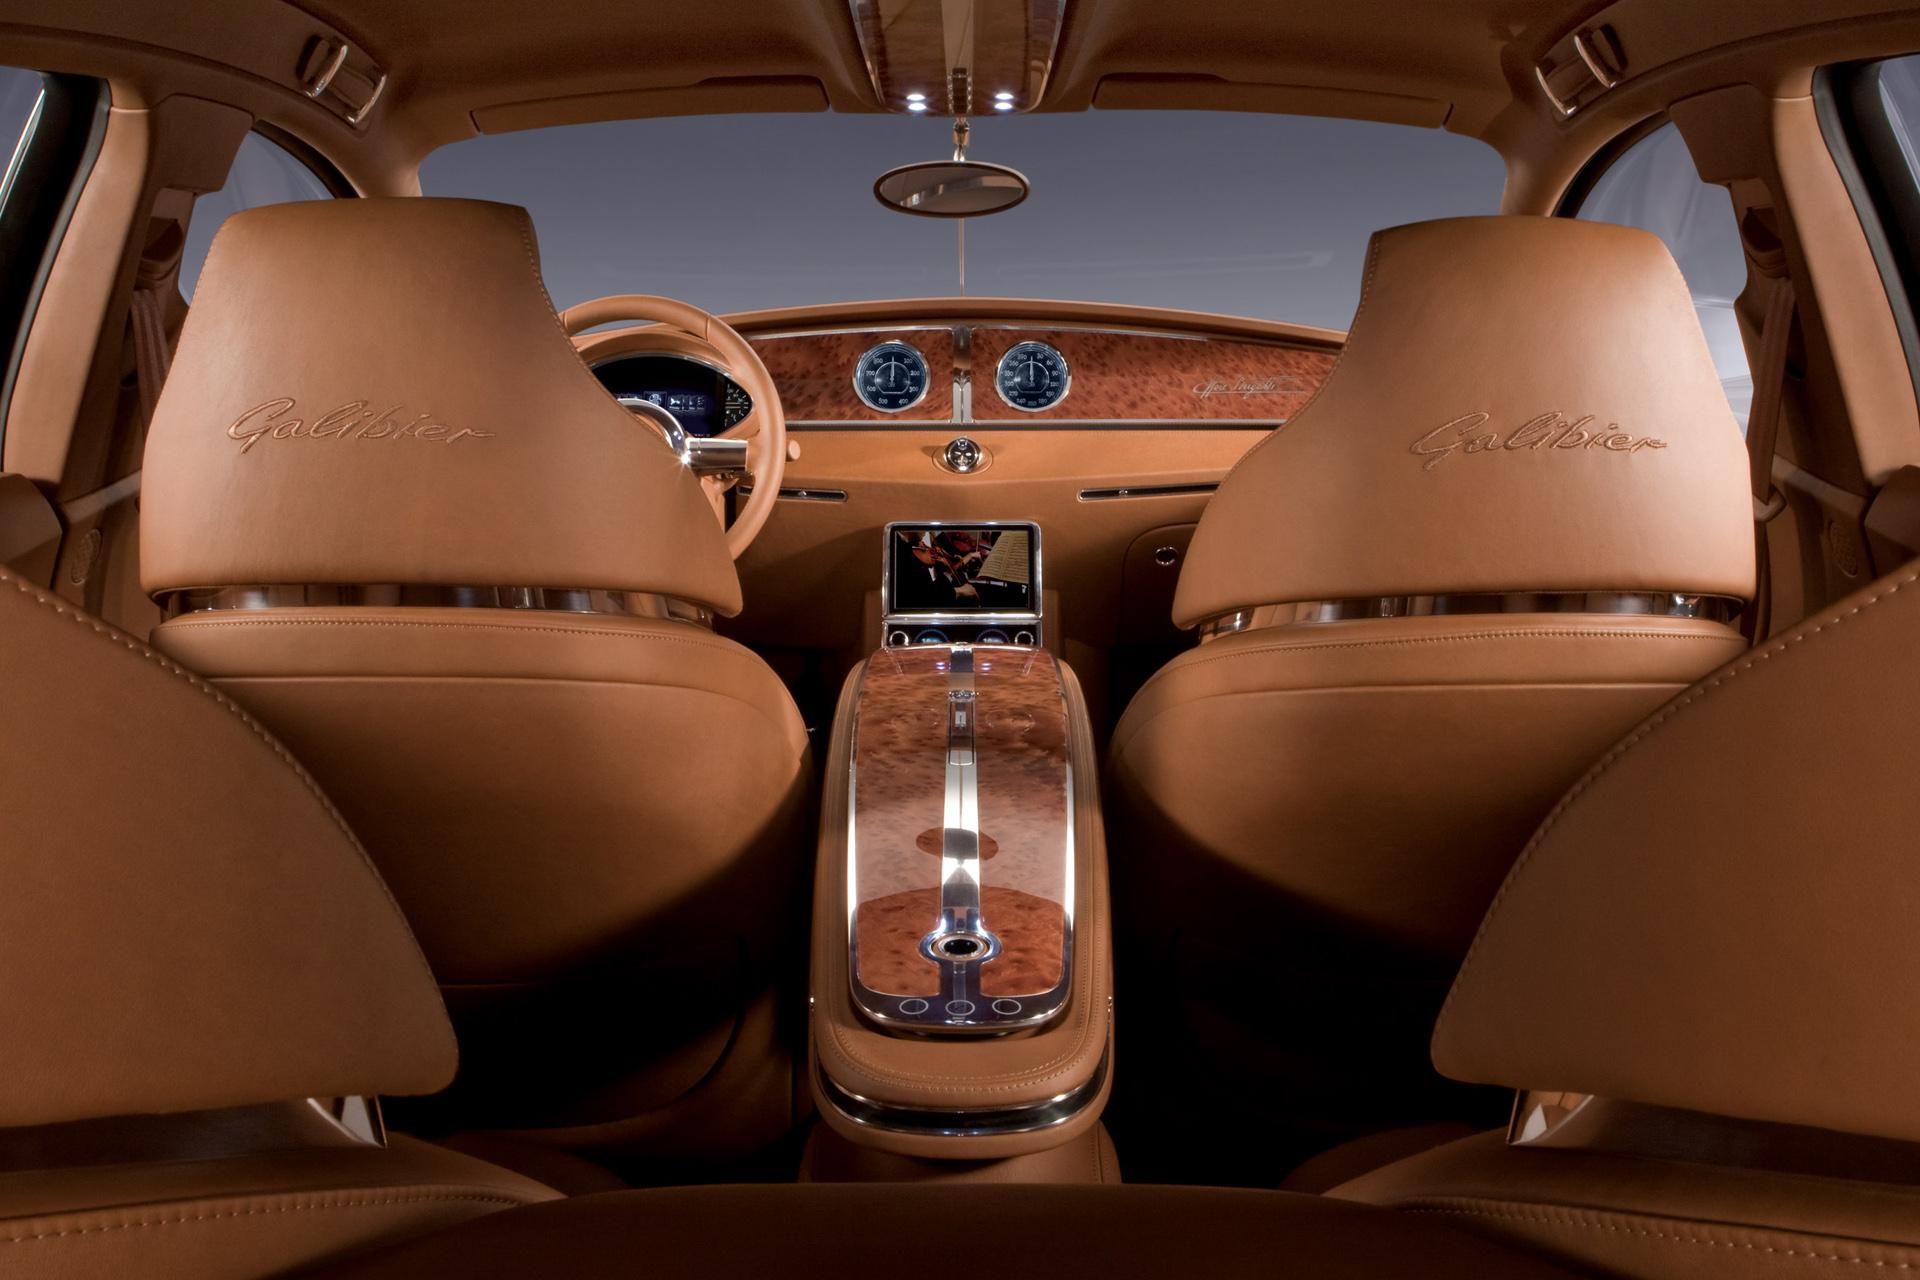 Салон, кресла, кожа, Bugatti, car, wallpaper, скачать фото обои на рабочий стол